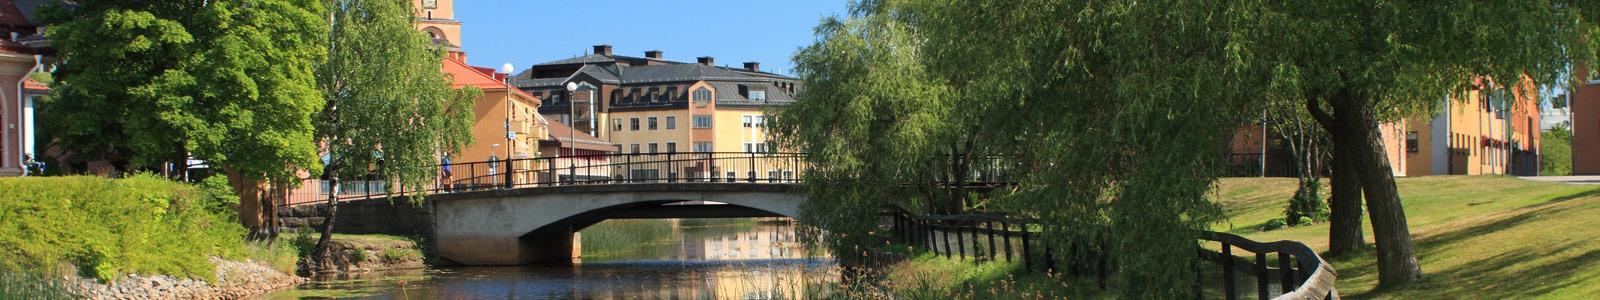 Musikkonservatoriet Falun - Bo i Falun